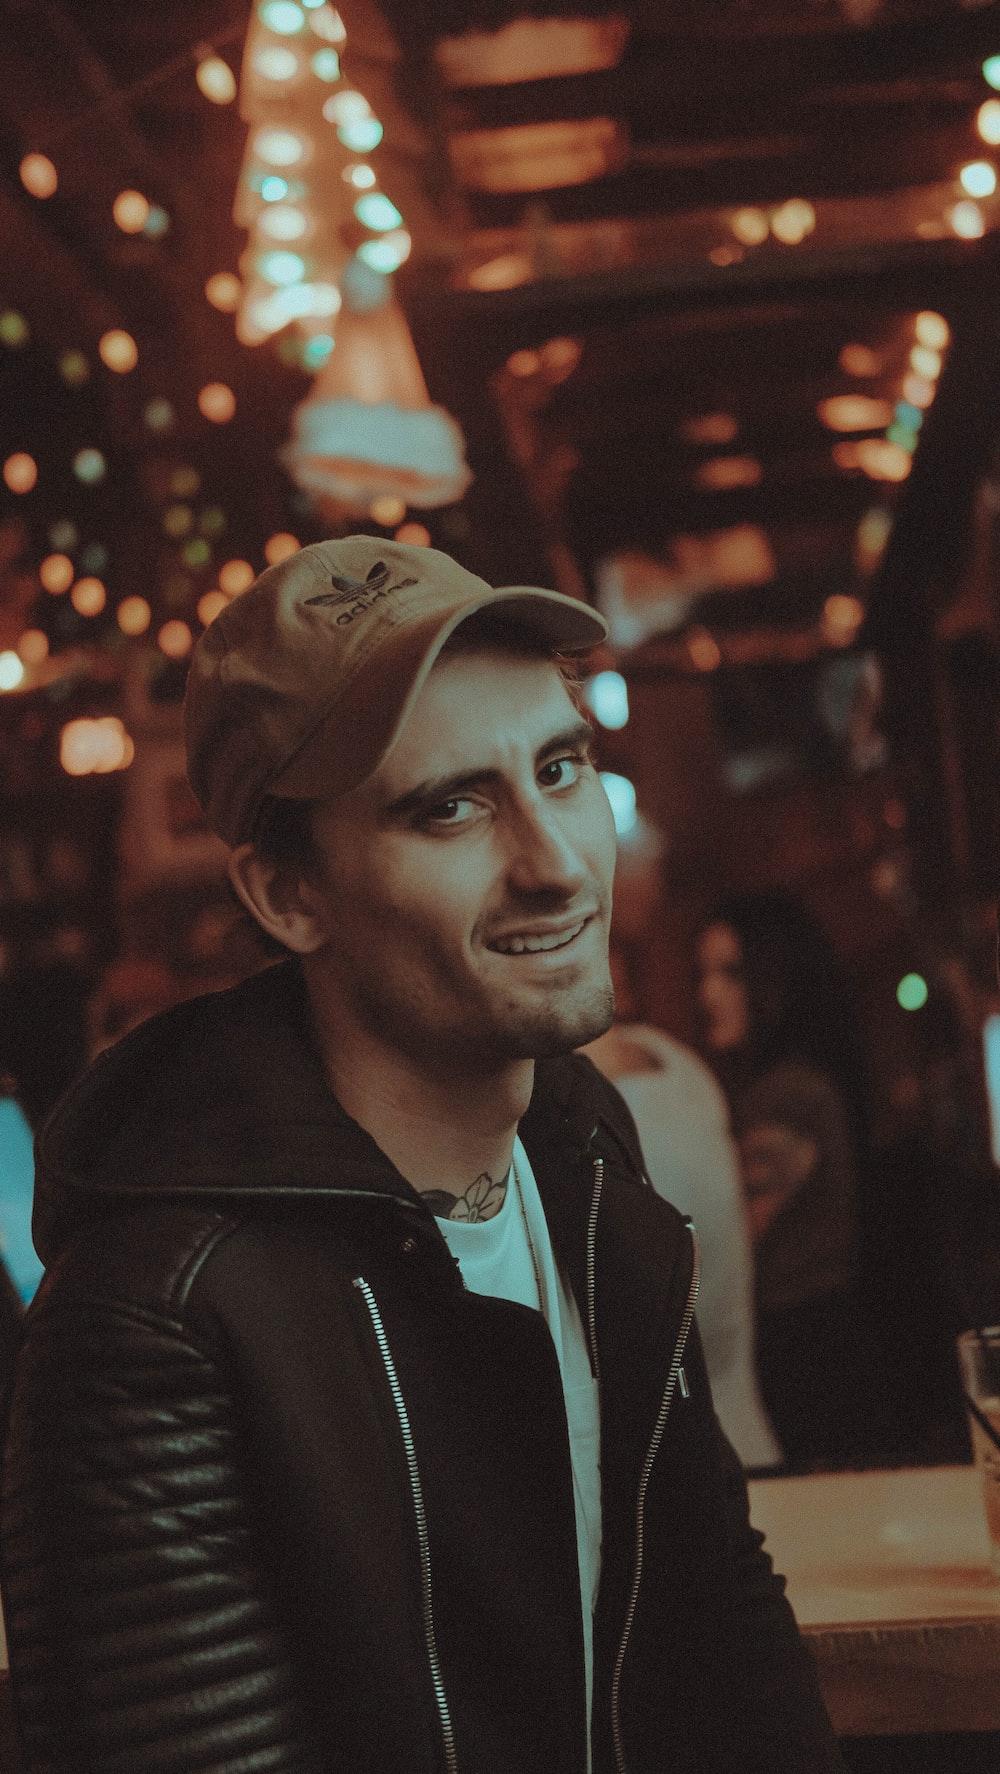 man wearing black jacket smiling inside brown room